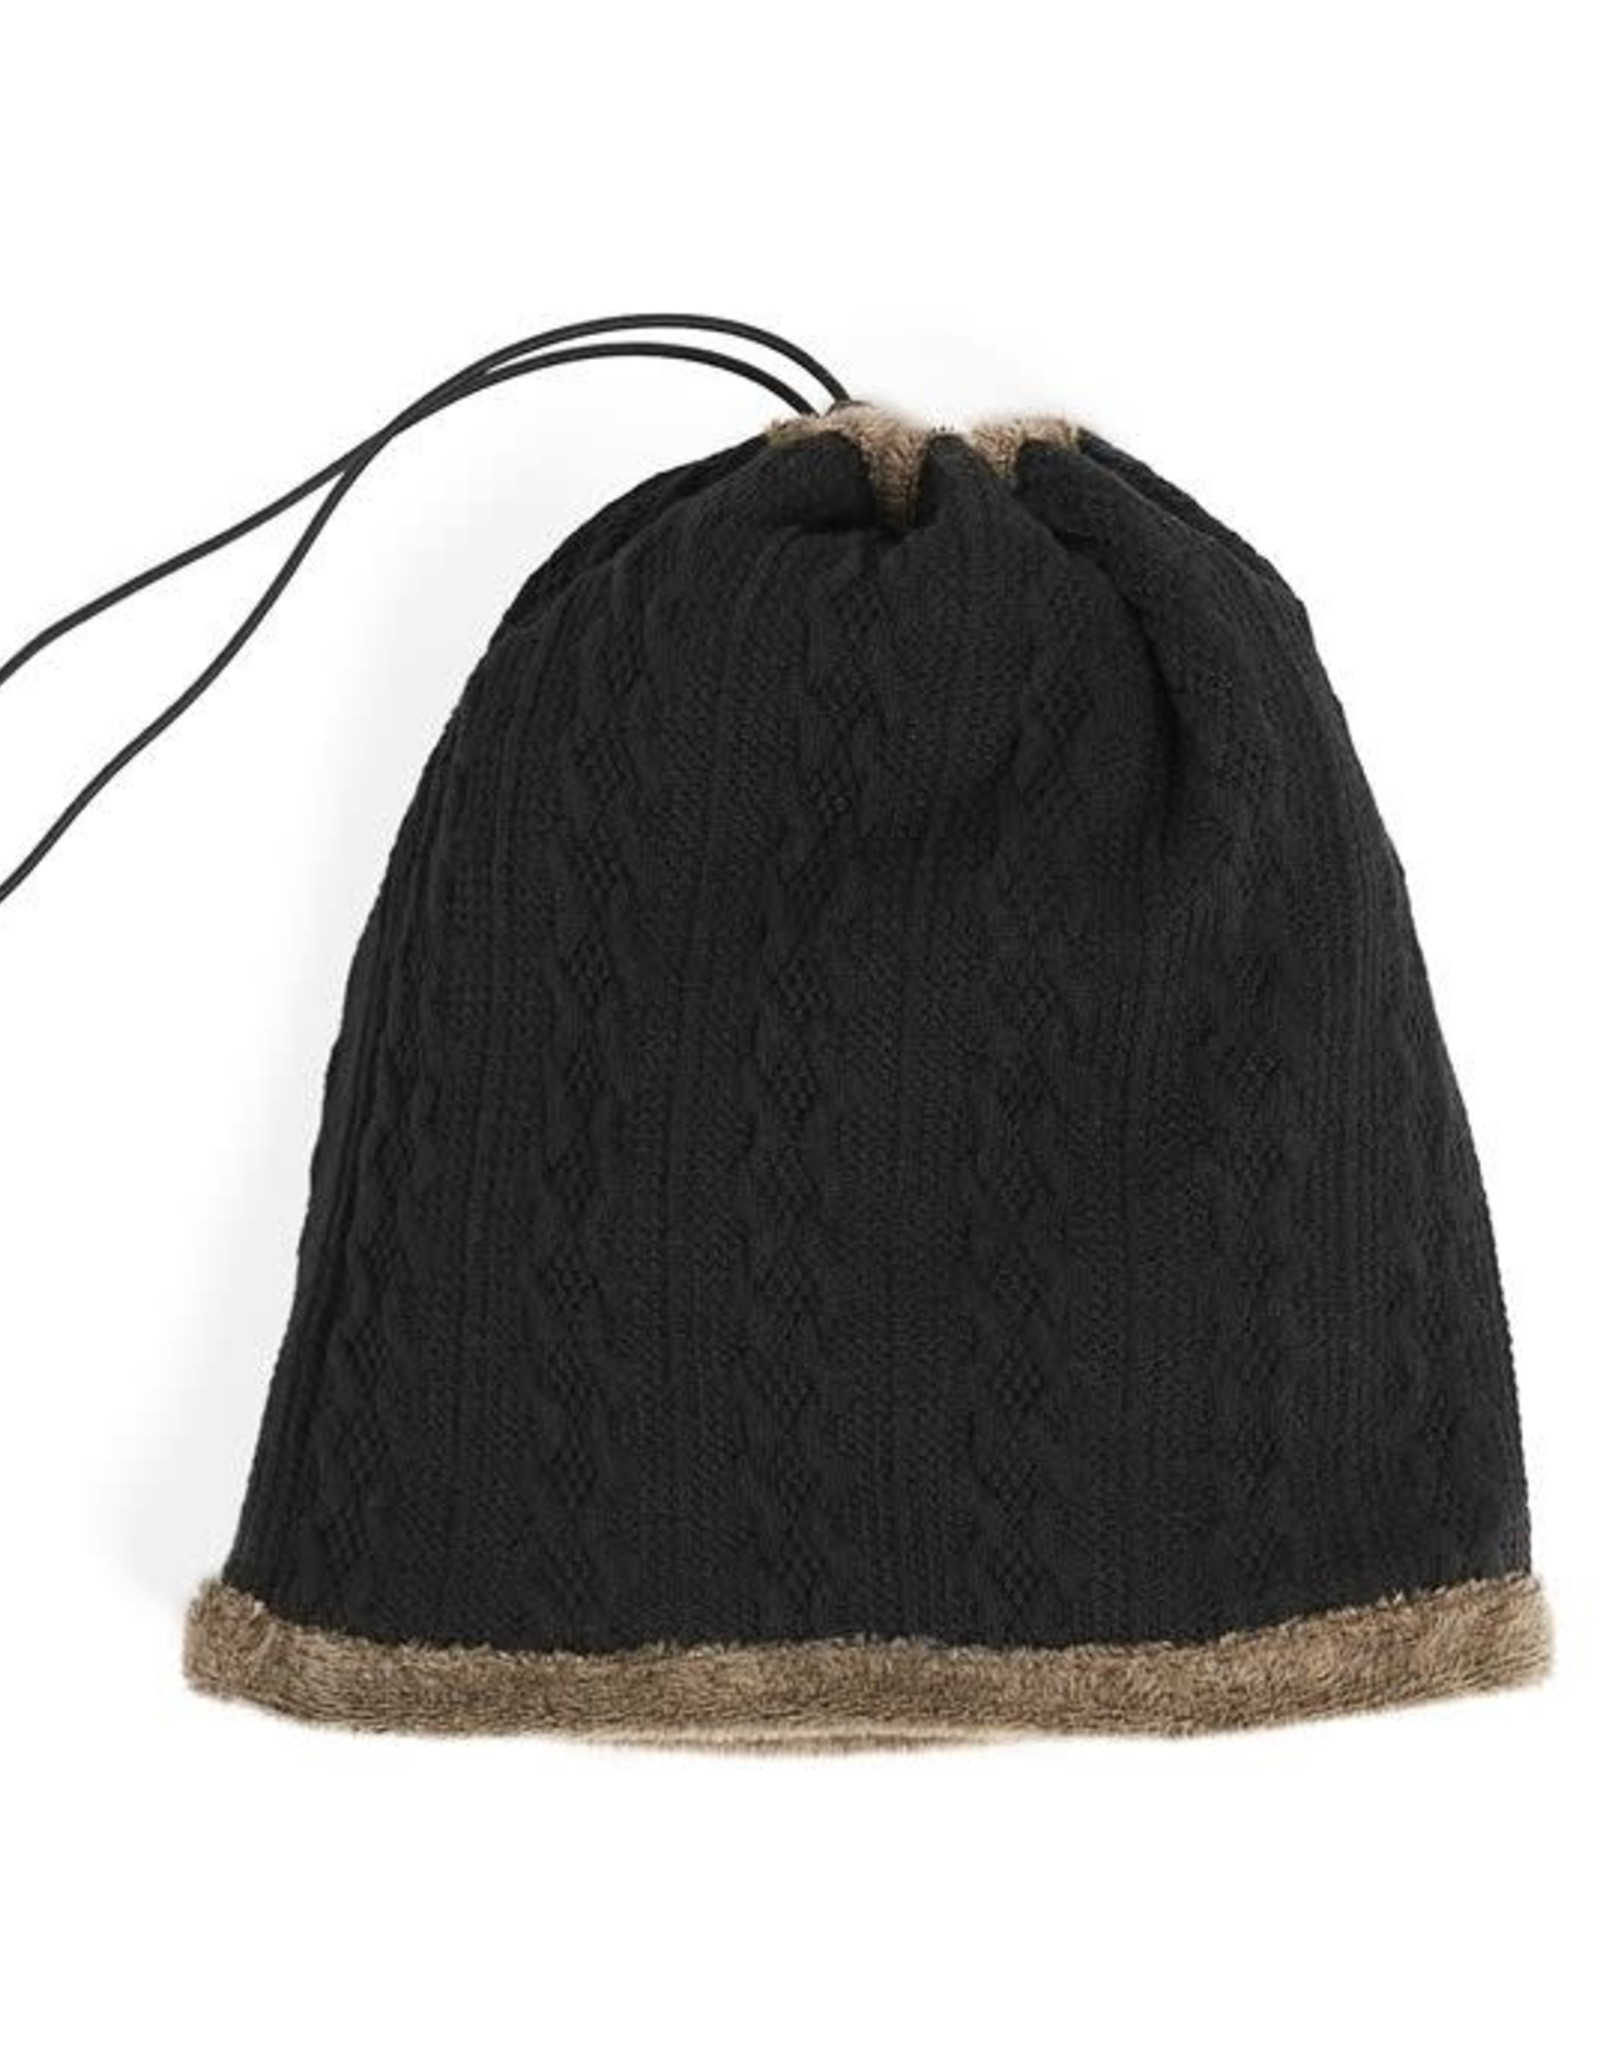 Coco & Carmen Convertible Snood/Hat